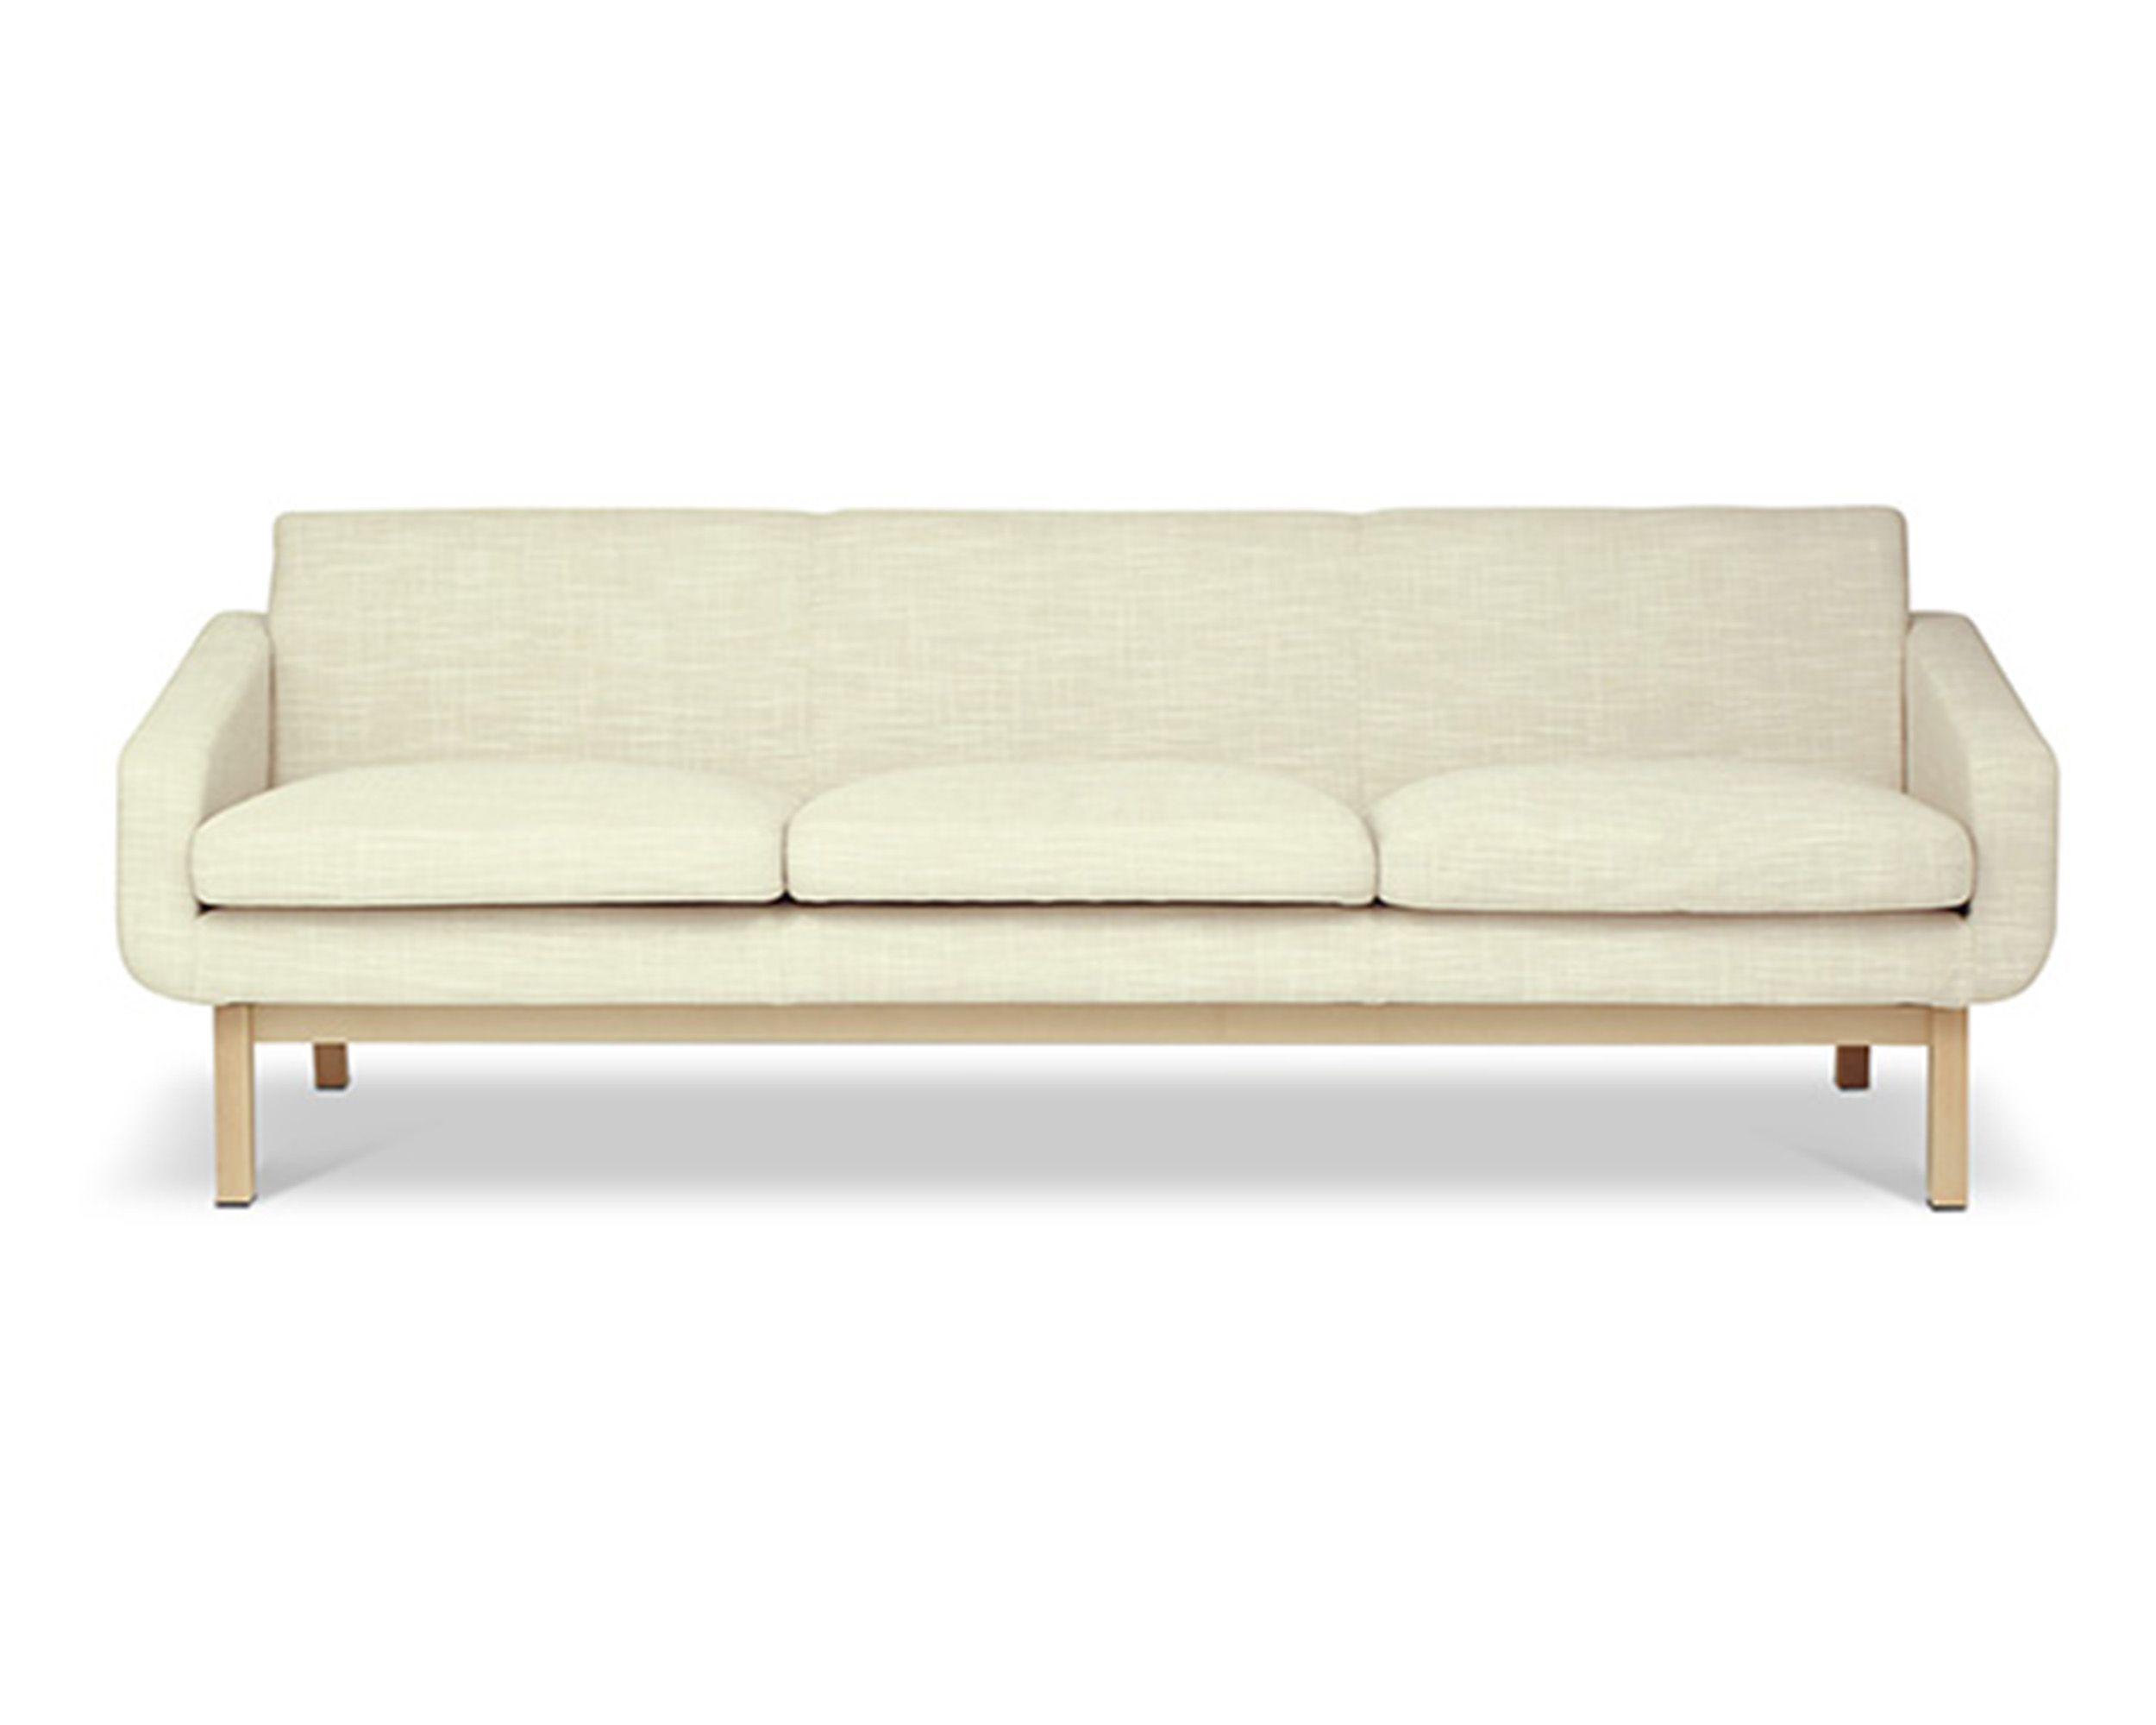 The Bern Scandinavian Inspired 3 Seat Sofa Natural Oak Legs